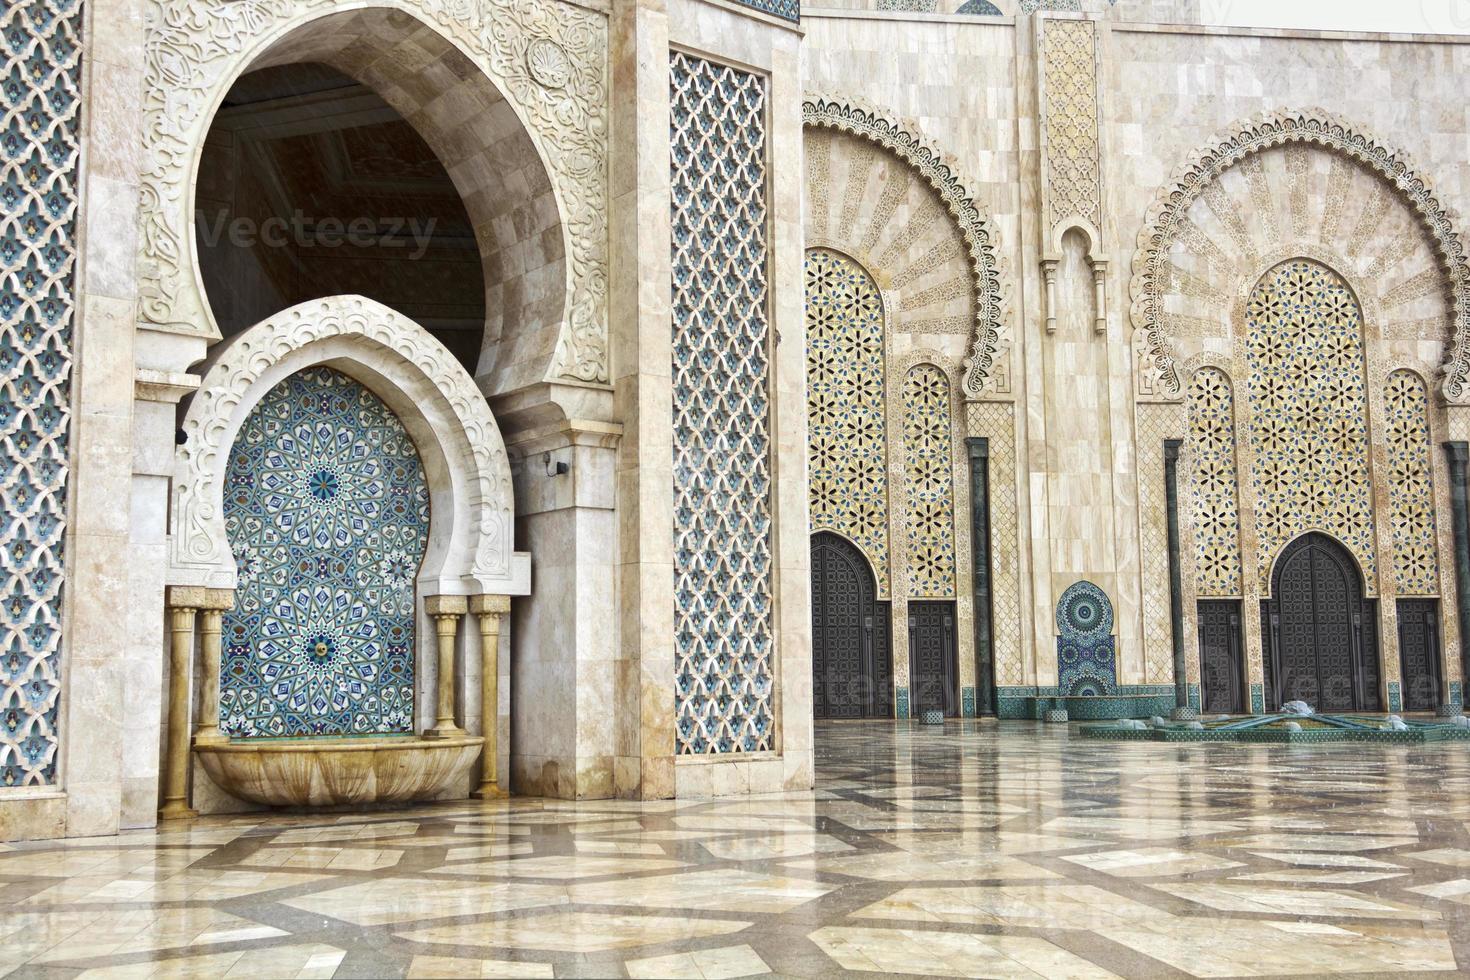 detalhe da mesquita hassan ii em casablanca, marrocos foto